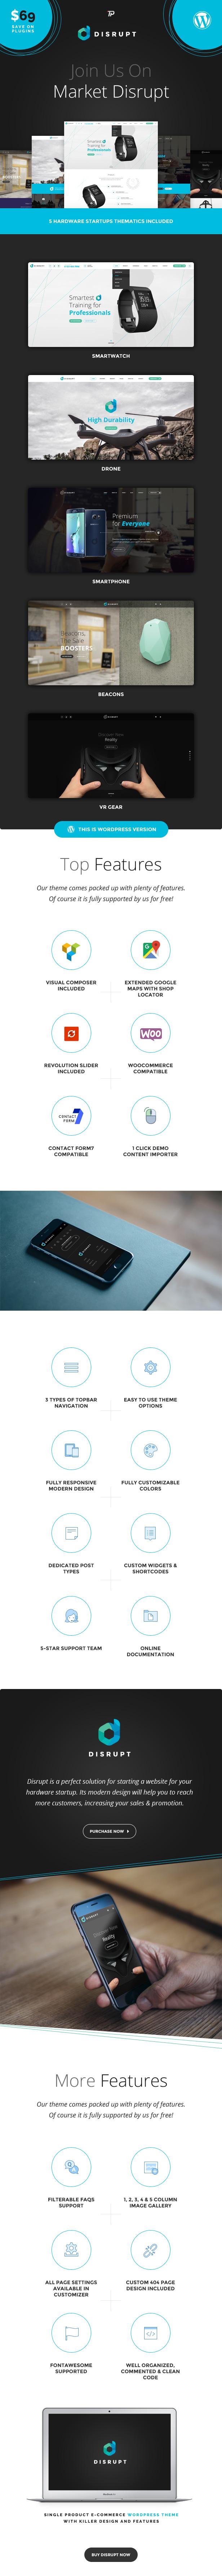 Disrupt - WooCoommerce Product WordPress Theme